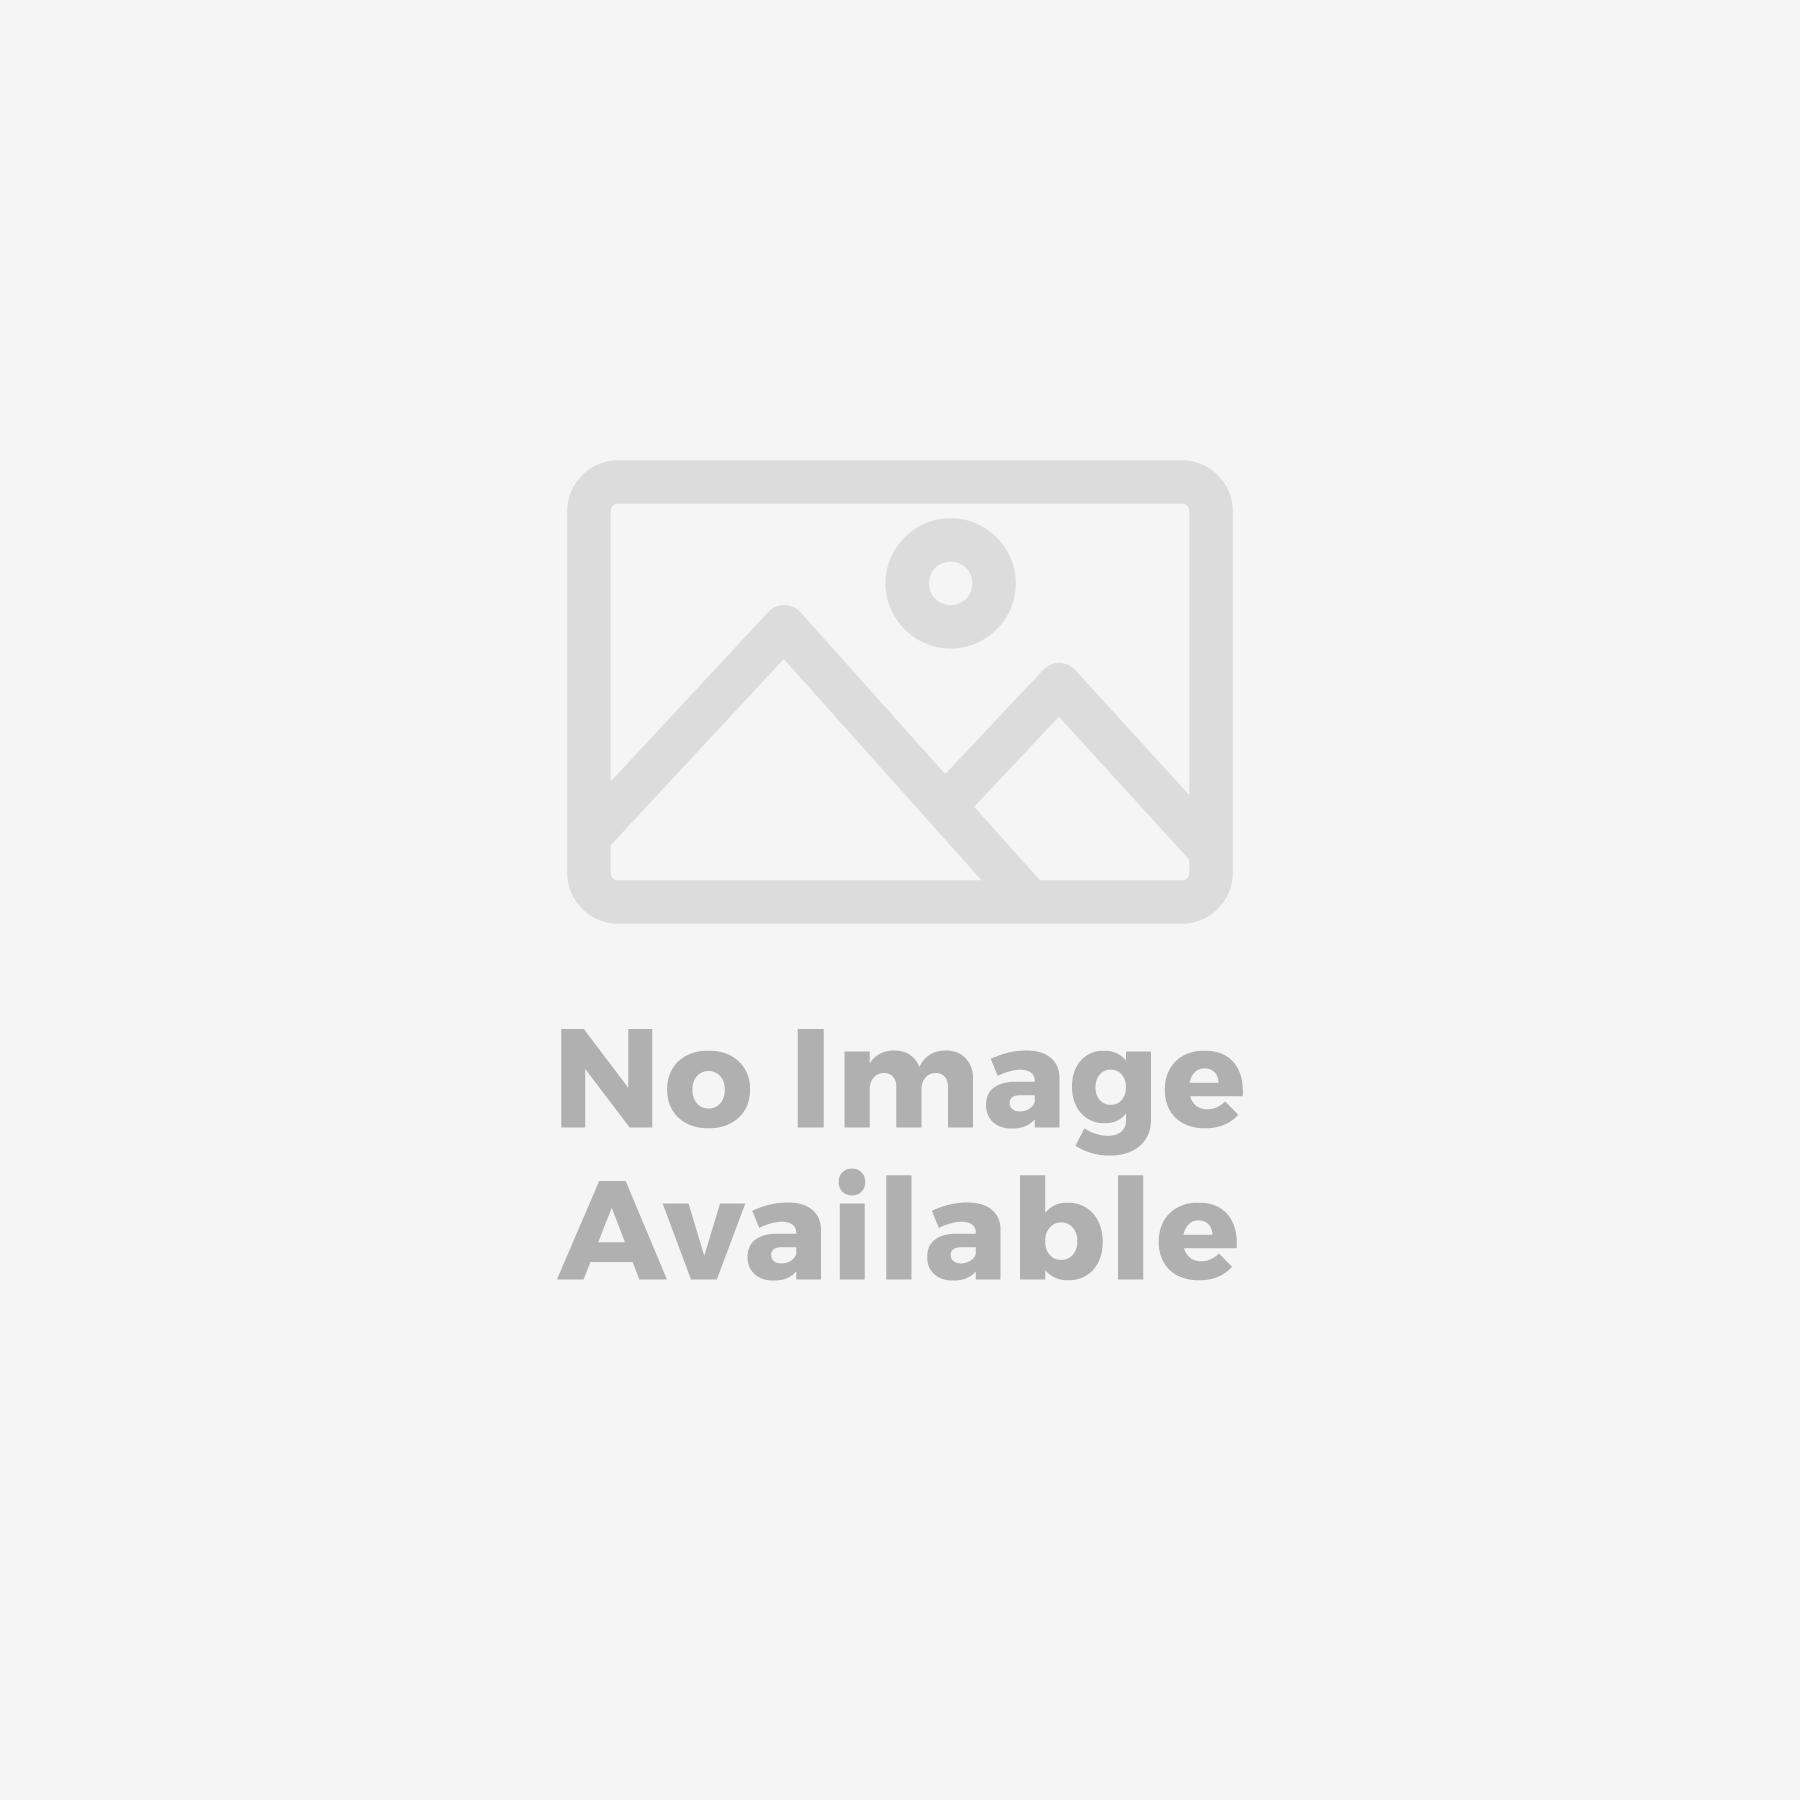 NORONHA END TABLE